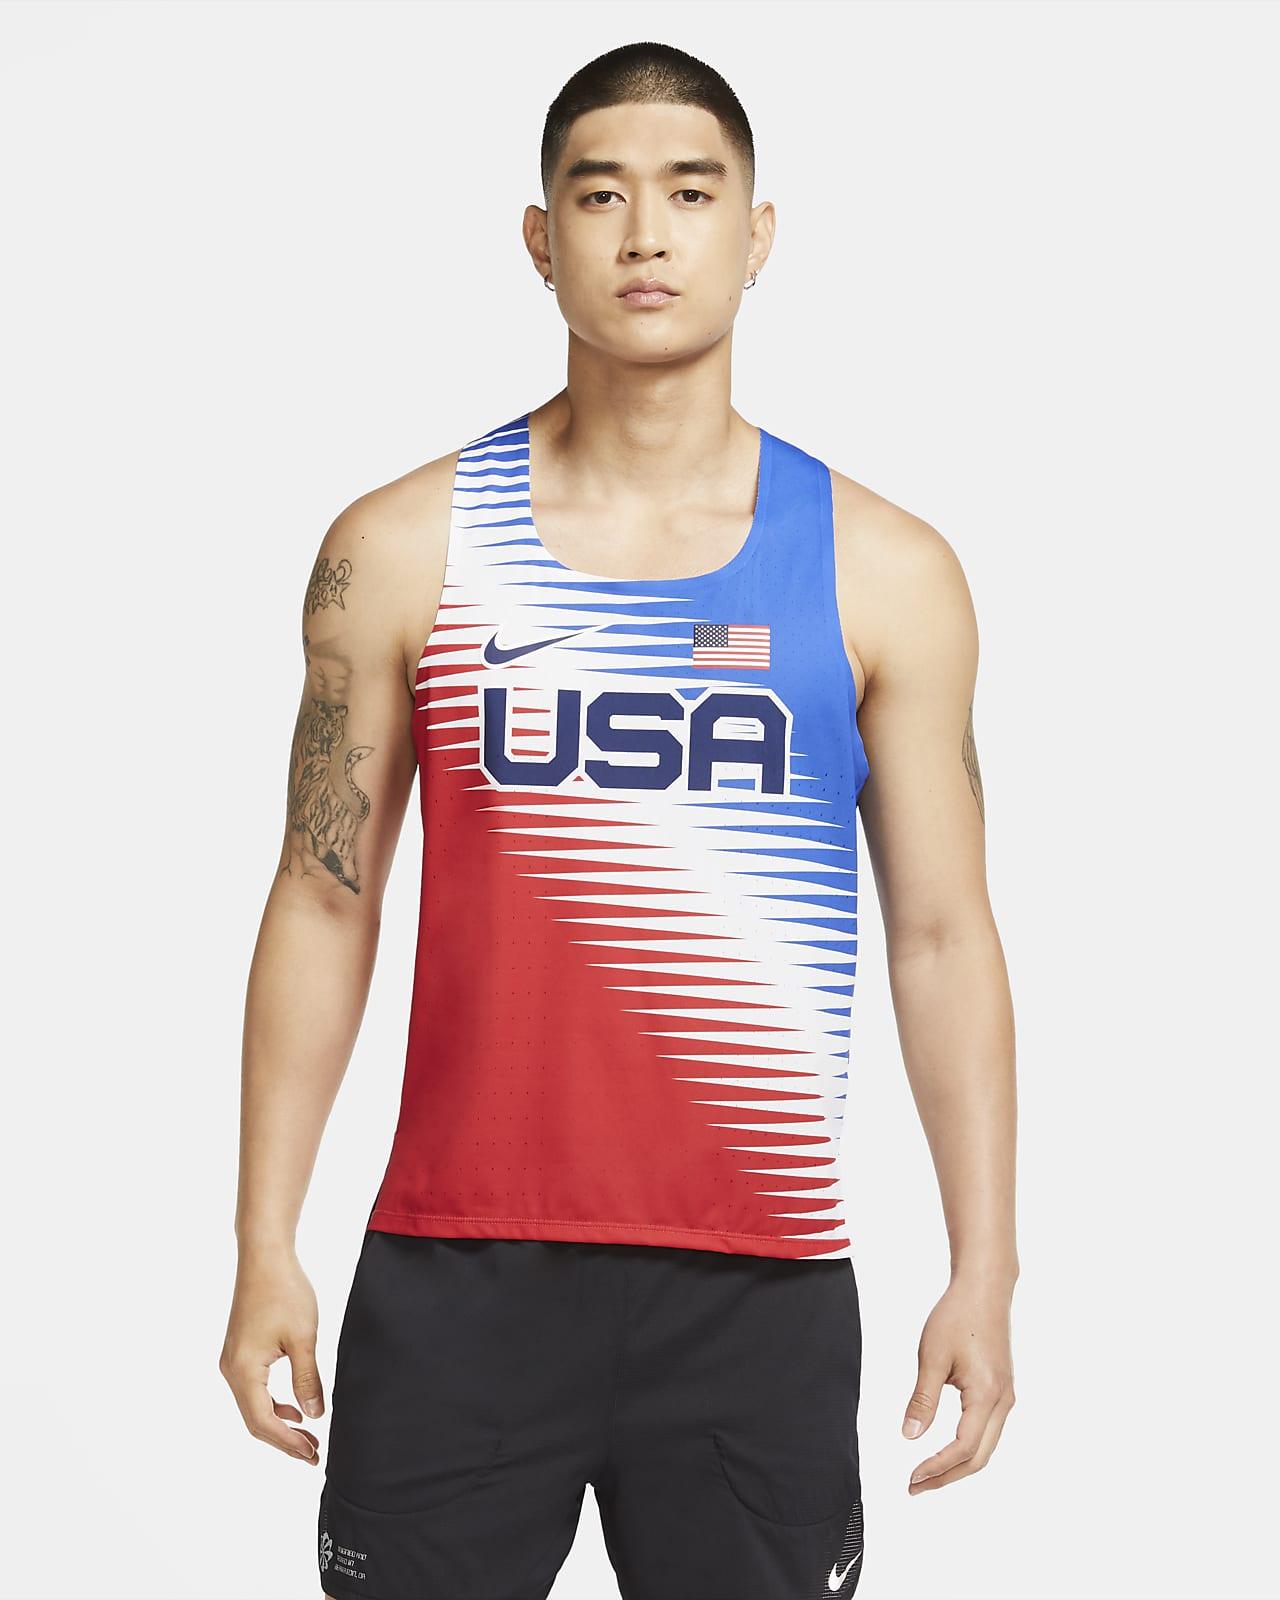 Camiseta sin mangas de running para hombre Nike Dri-FIT ADV Team USA AeroSwift